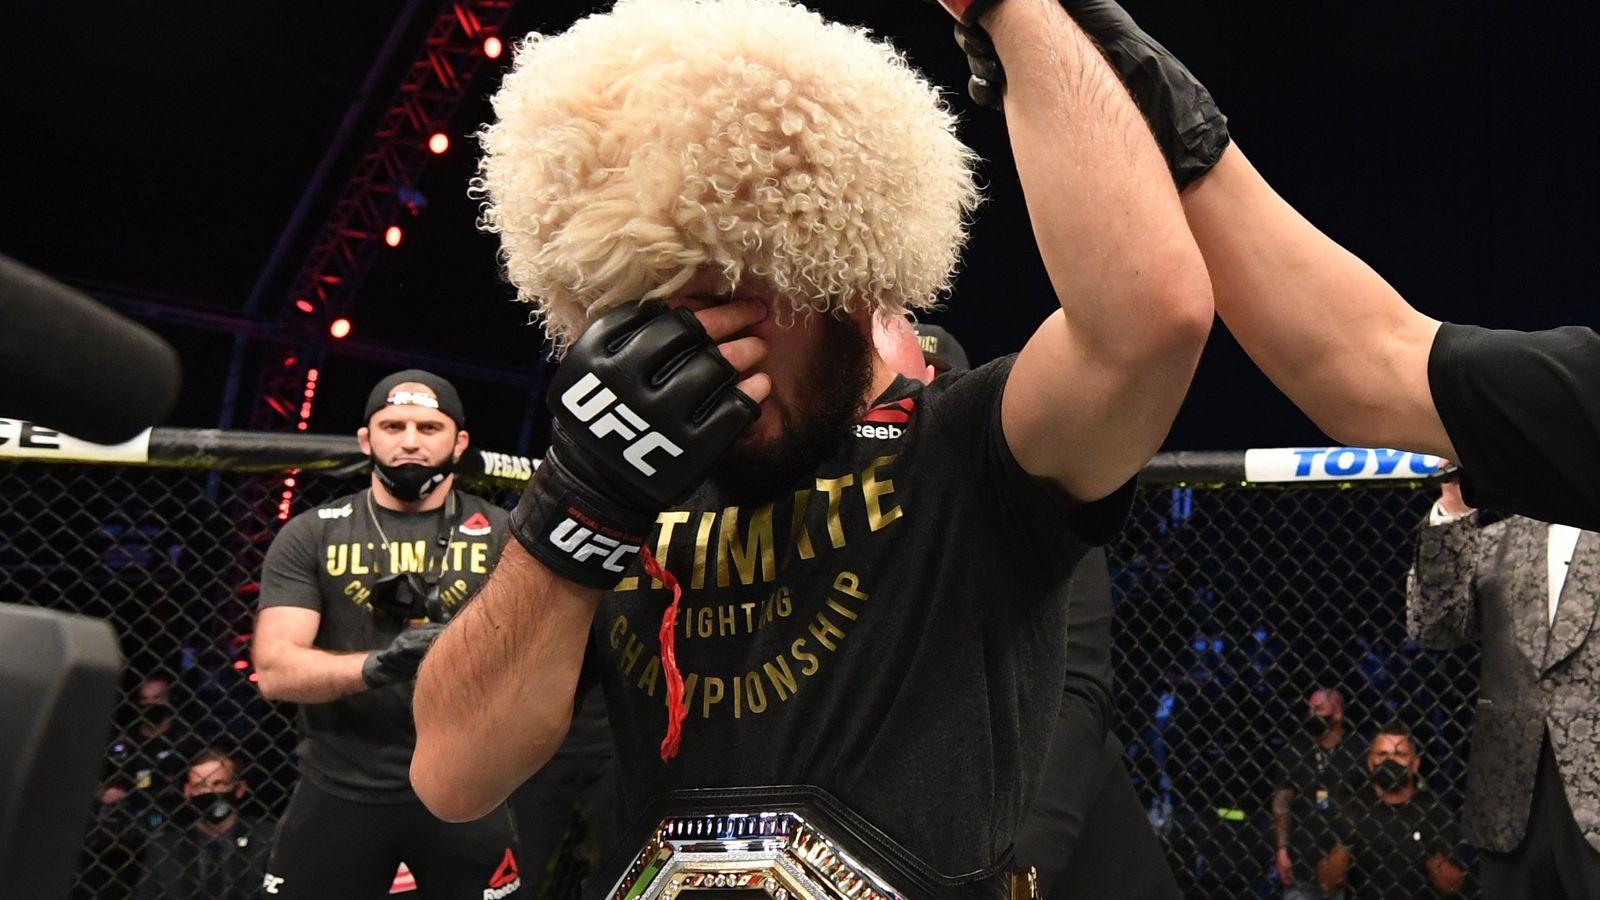 UFC254: Khabib Nurmagomedov retires after beating Justin Gaethje